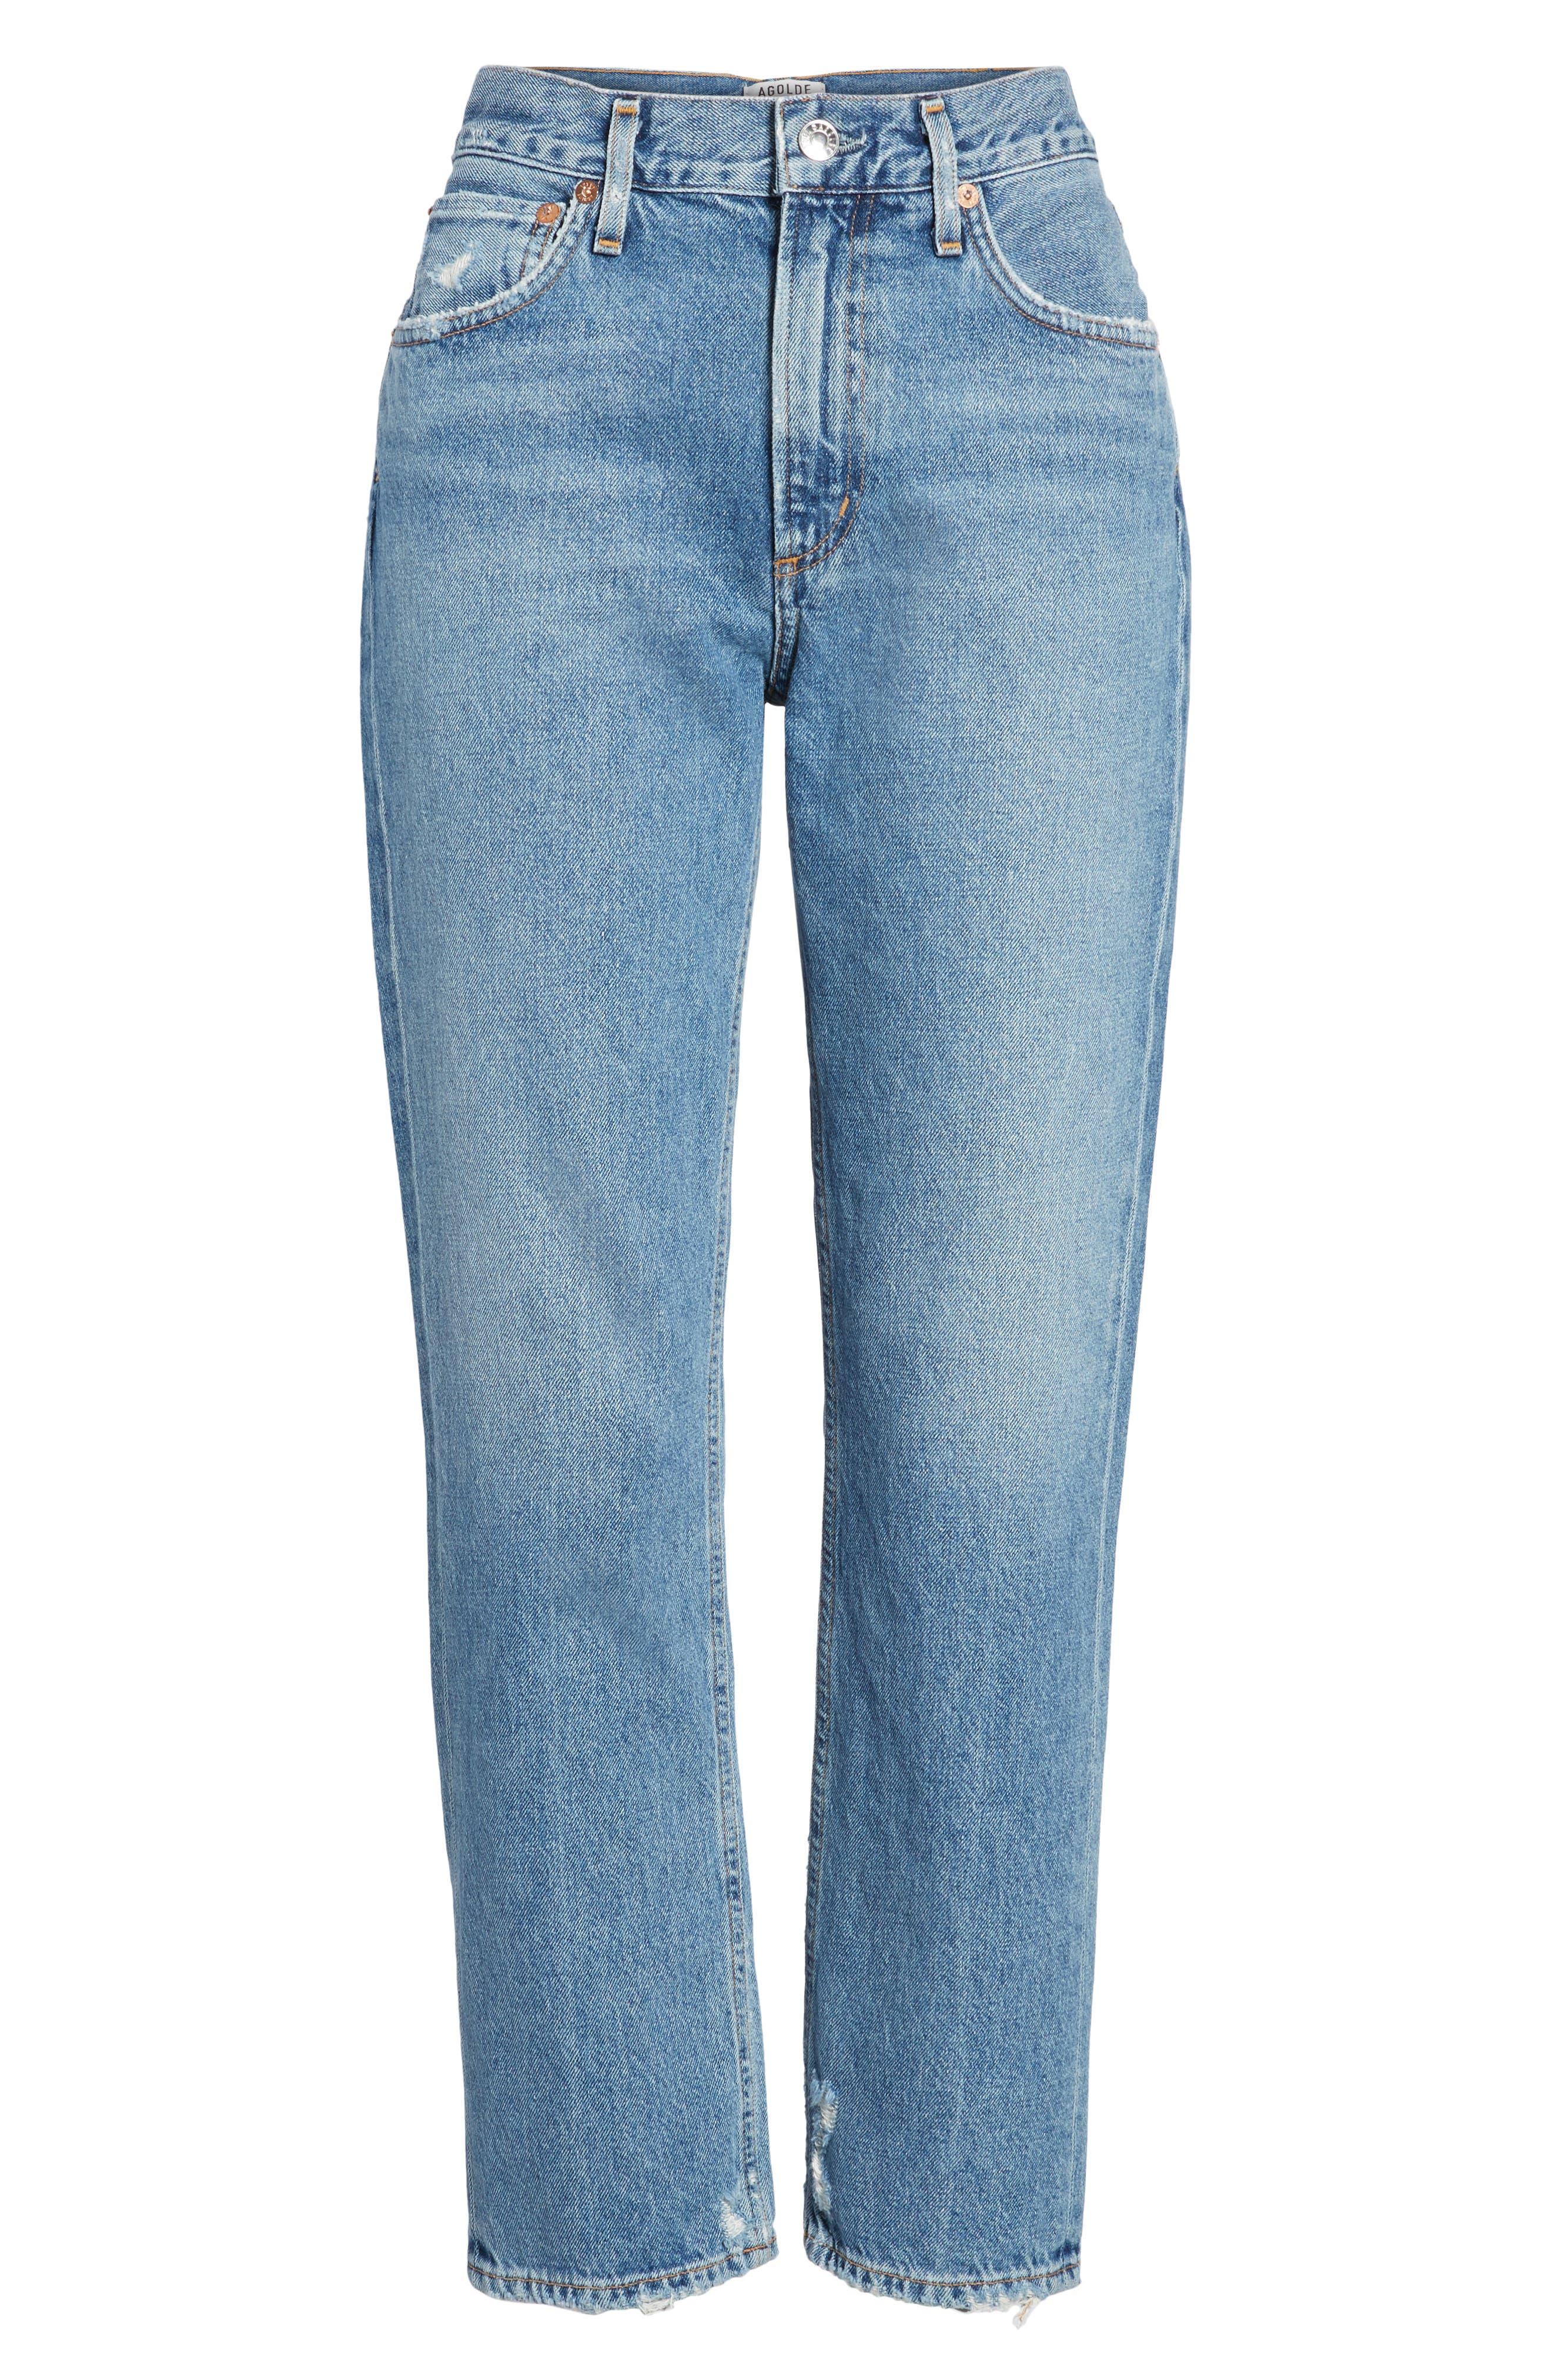 Cigarette High Waist Jeans,                             Alternate thumbnail 6, color,                             PASSENGER